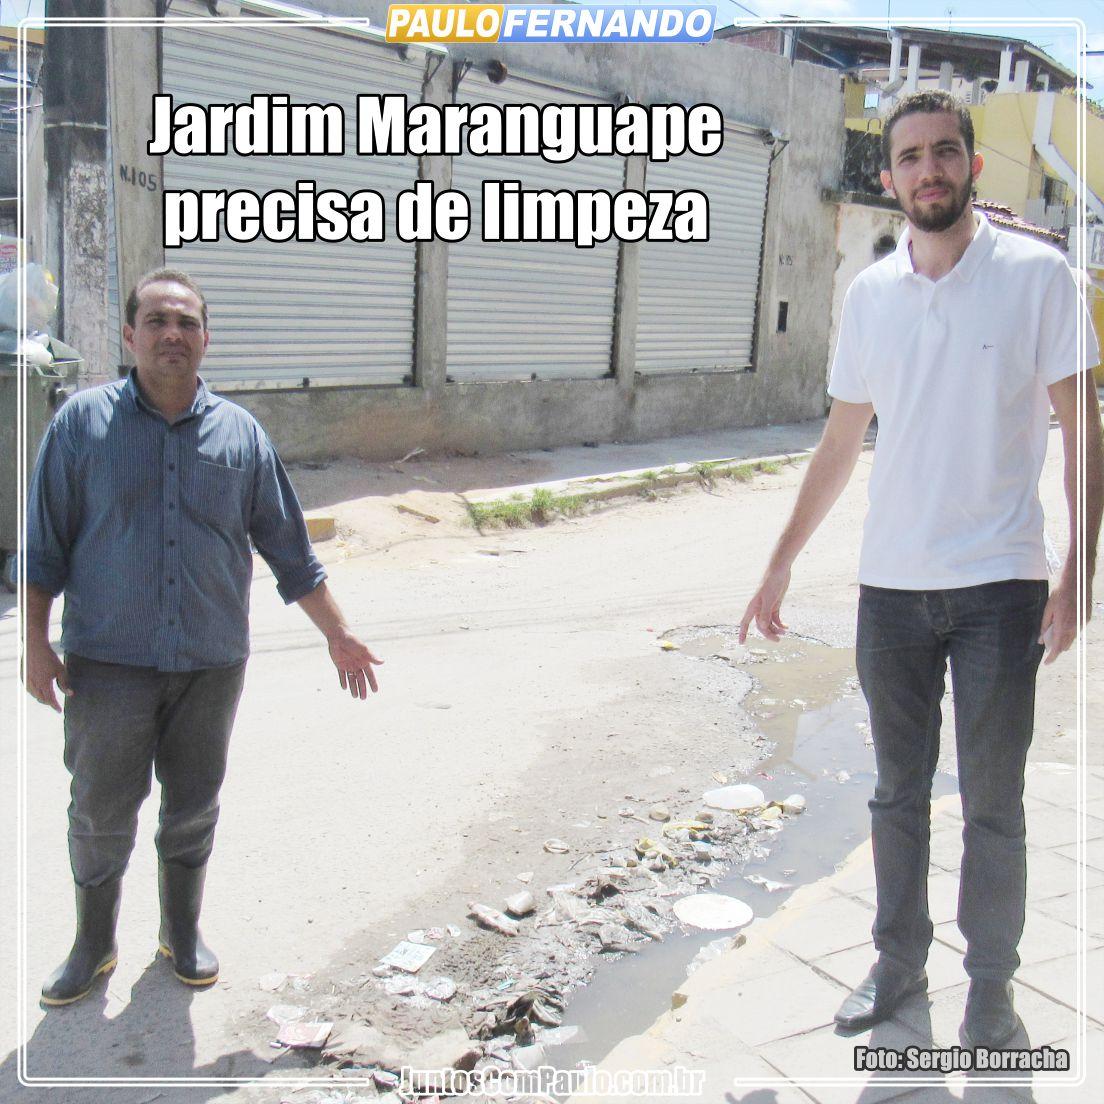 Jardim Maranguape precisa de atenção